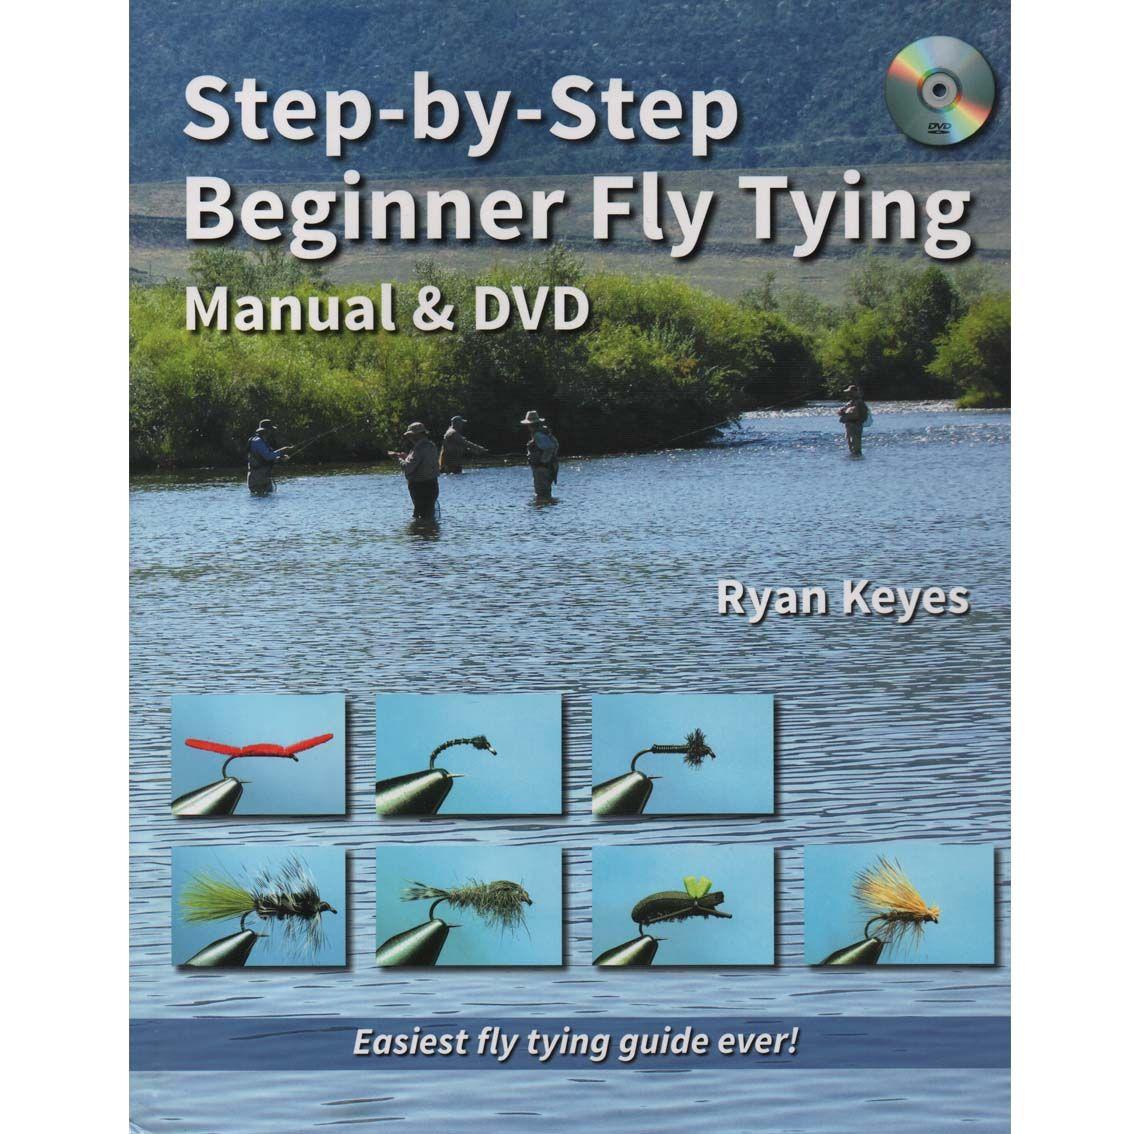 Livro Step-by-Step Beginner Fly Tying com DVD (Ryan Keyes)